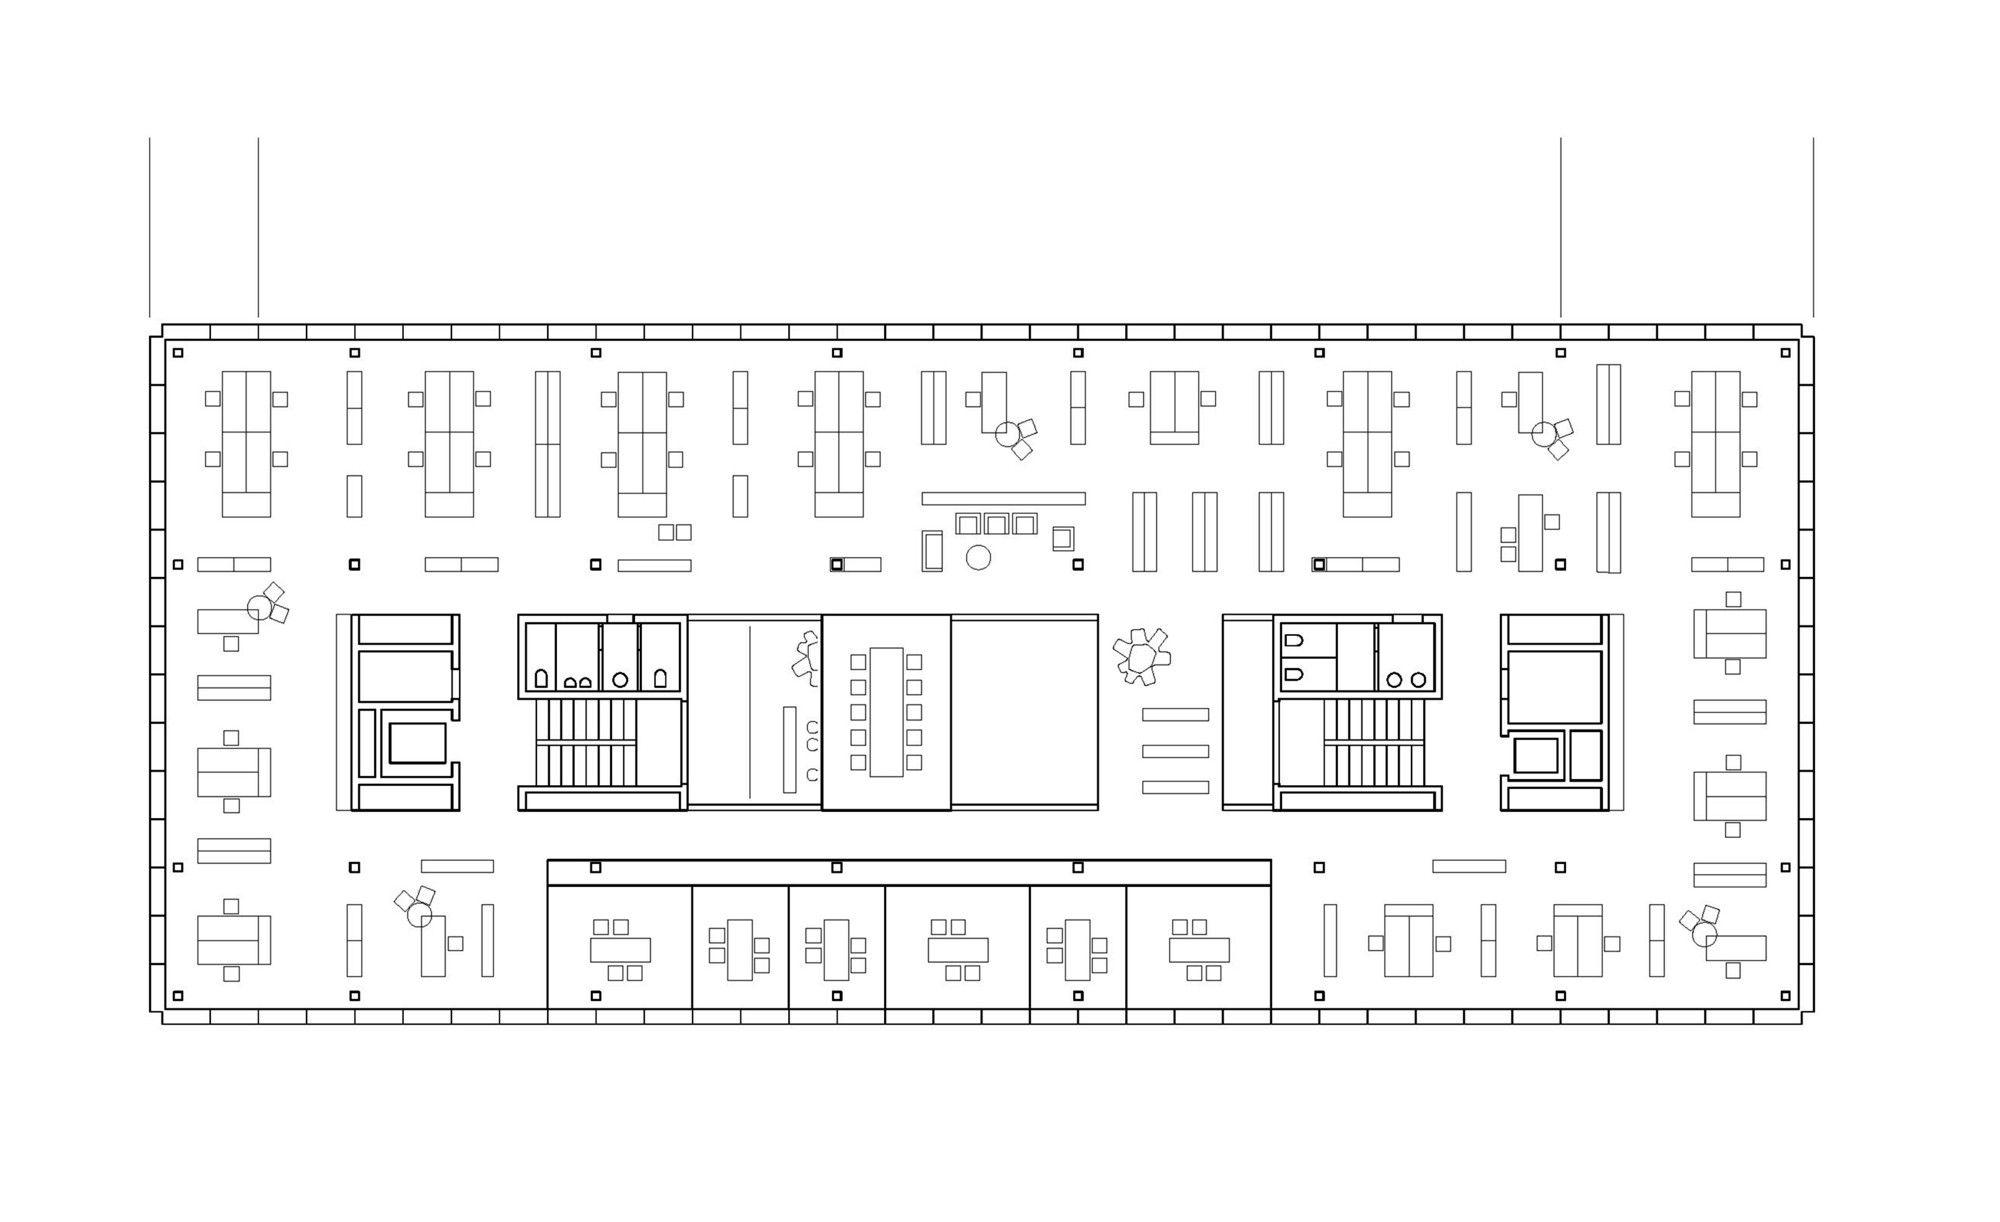 Office Building Floor Plans: Pin By Enrique Mendizabal On Think Tank Design